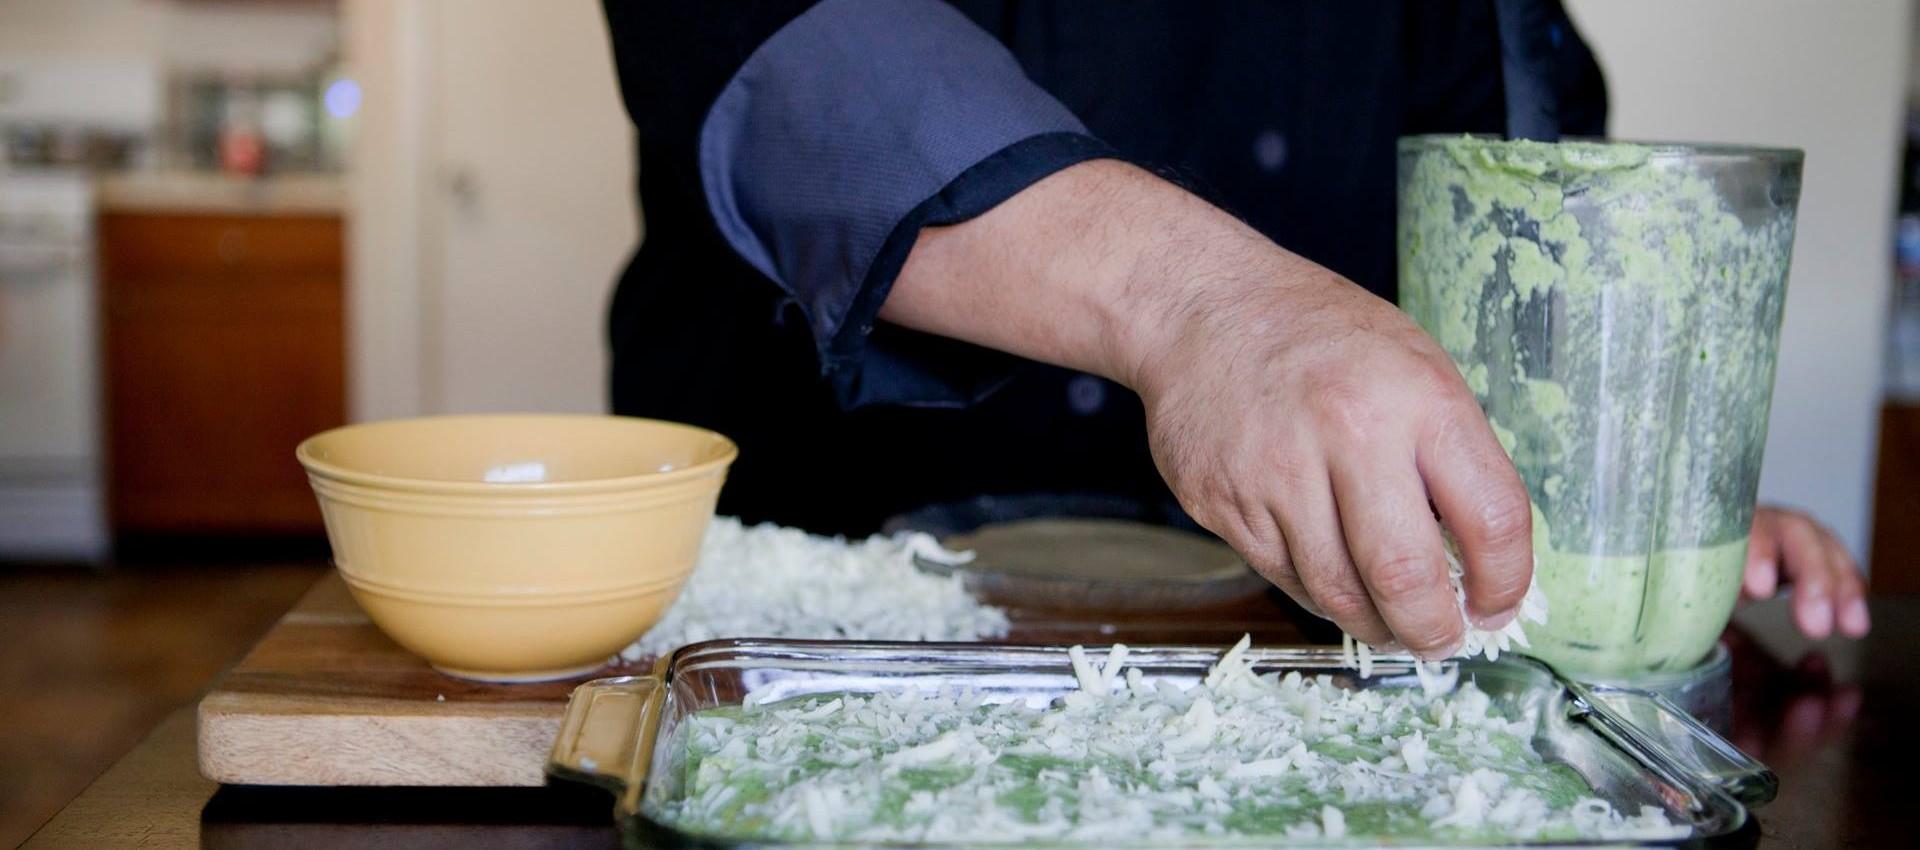 Enchiladas Suizas Recipe Image